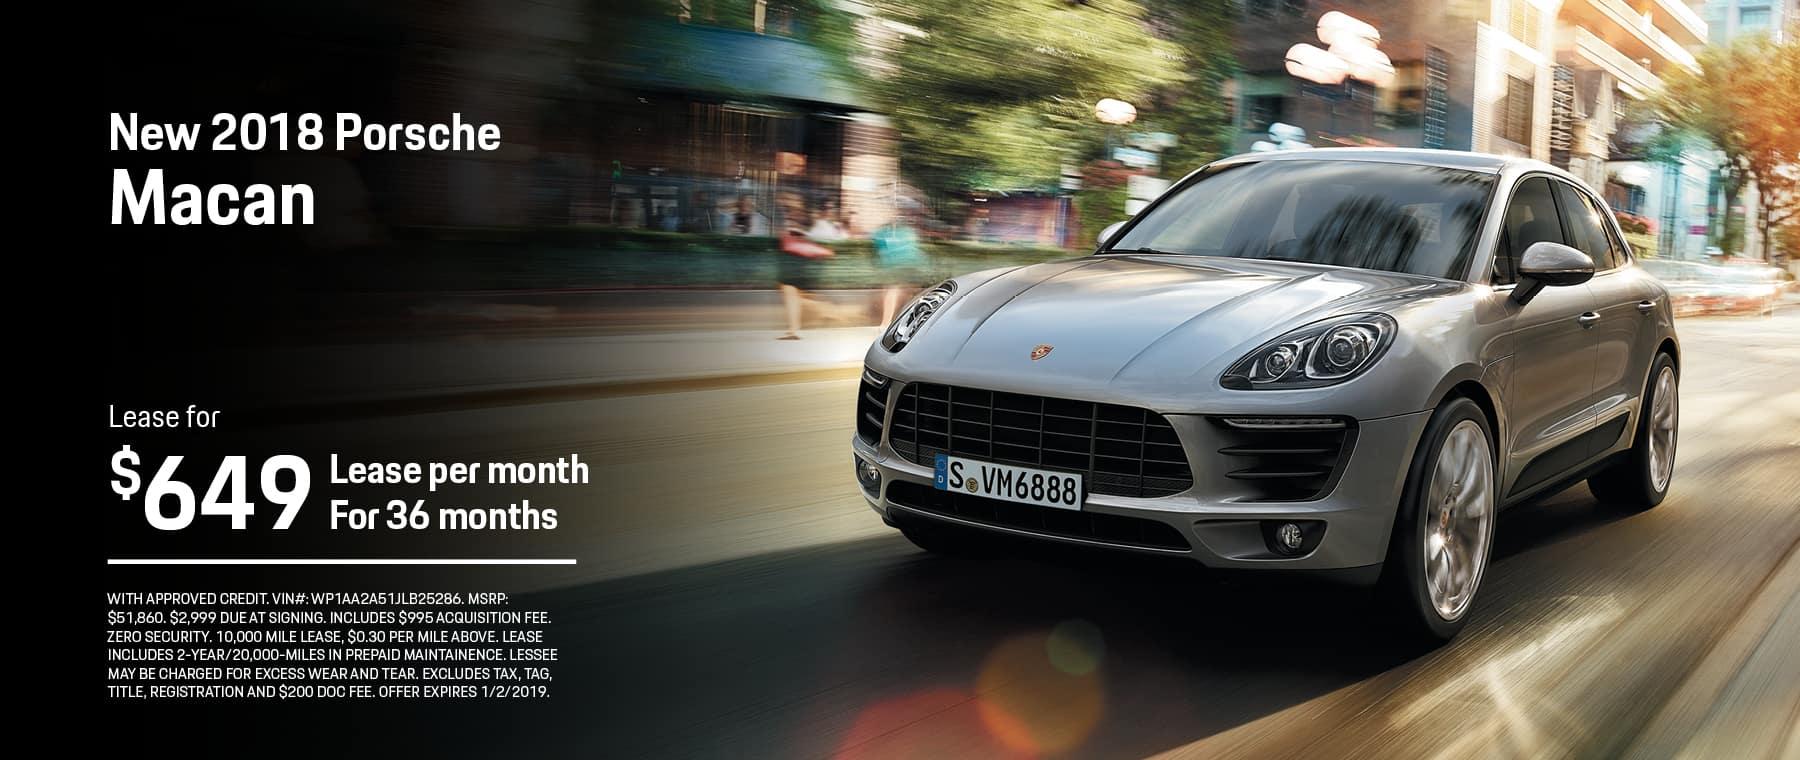 Porsche Macan Lease Deals Zero Down | Lamoureph Blog